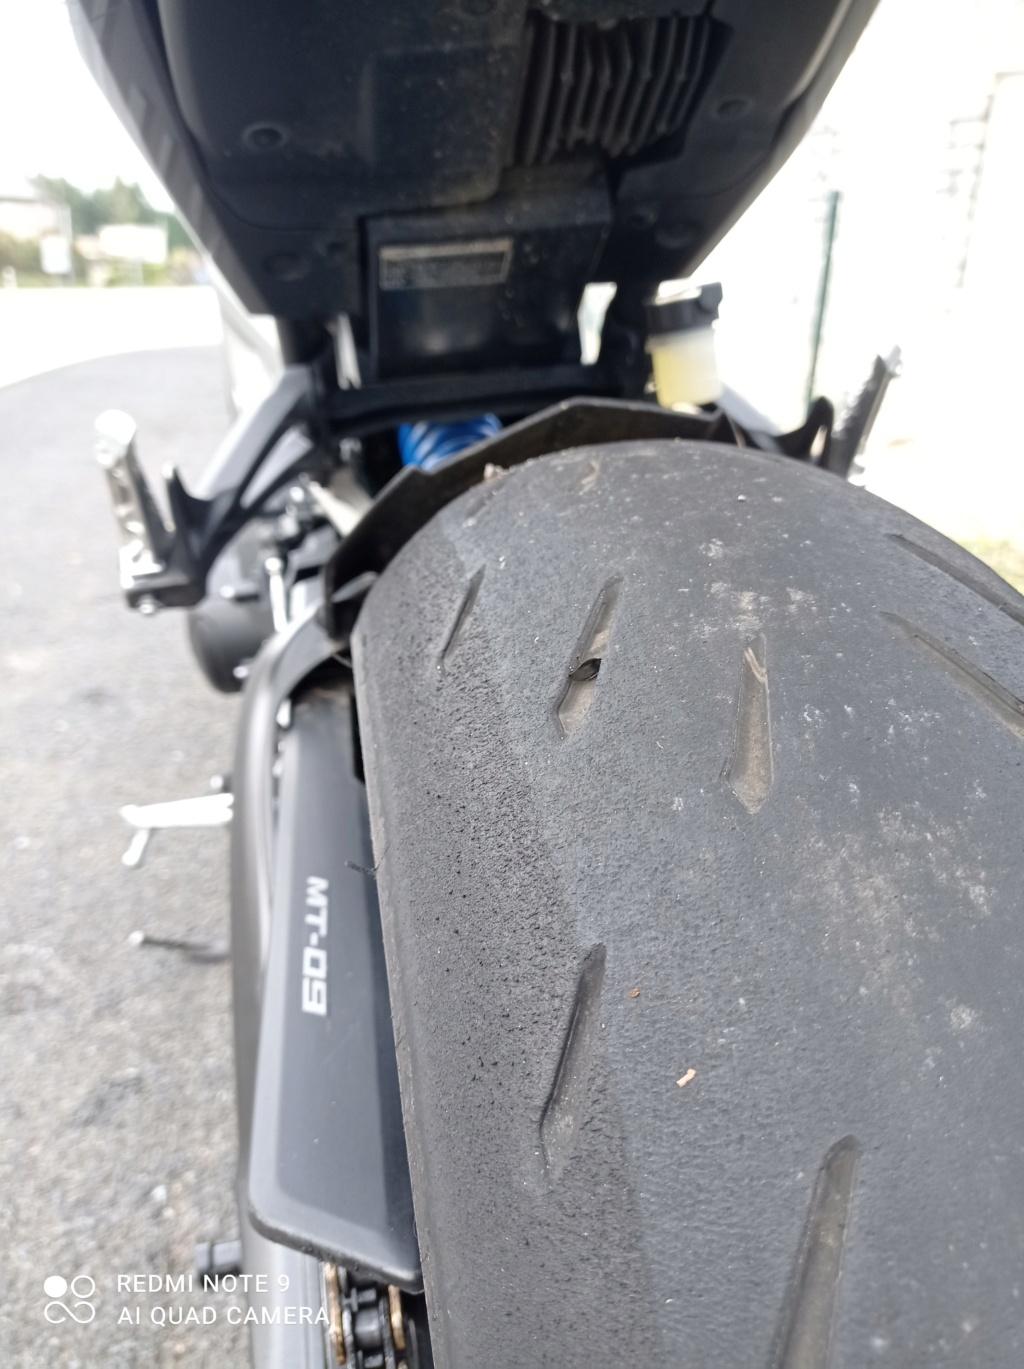 changement pneu et choix? - Page 3 Img_2025